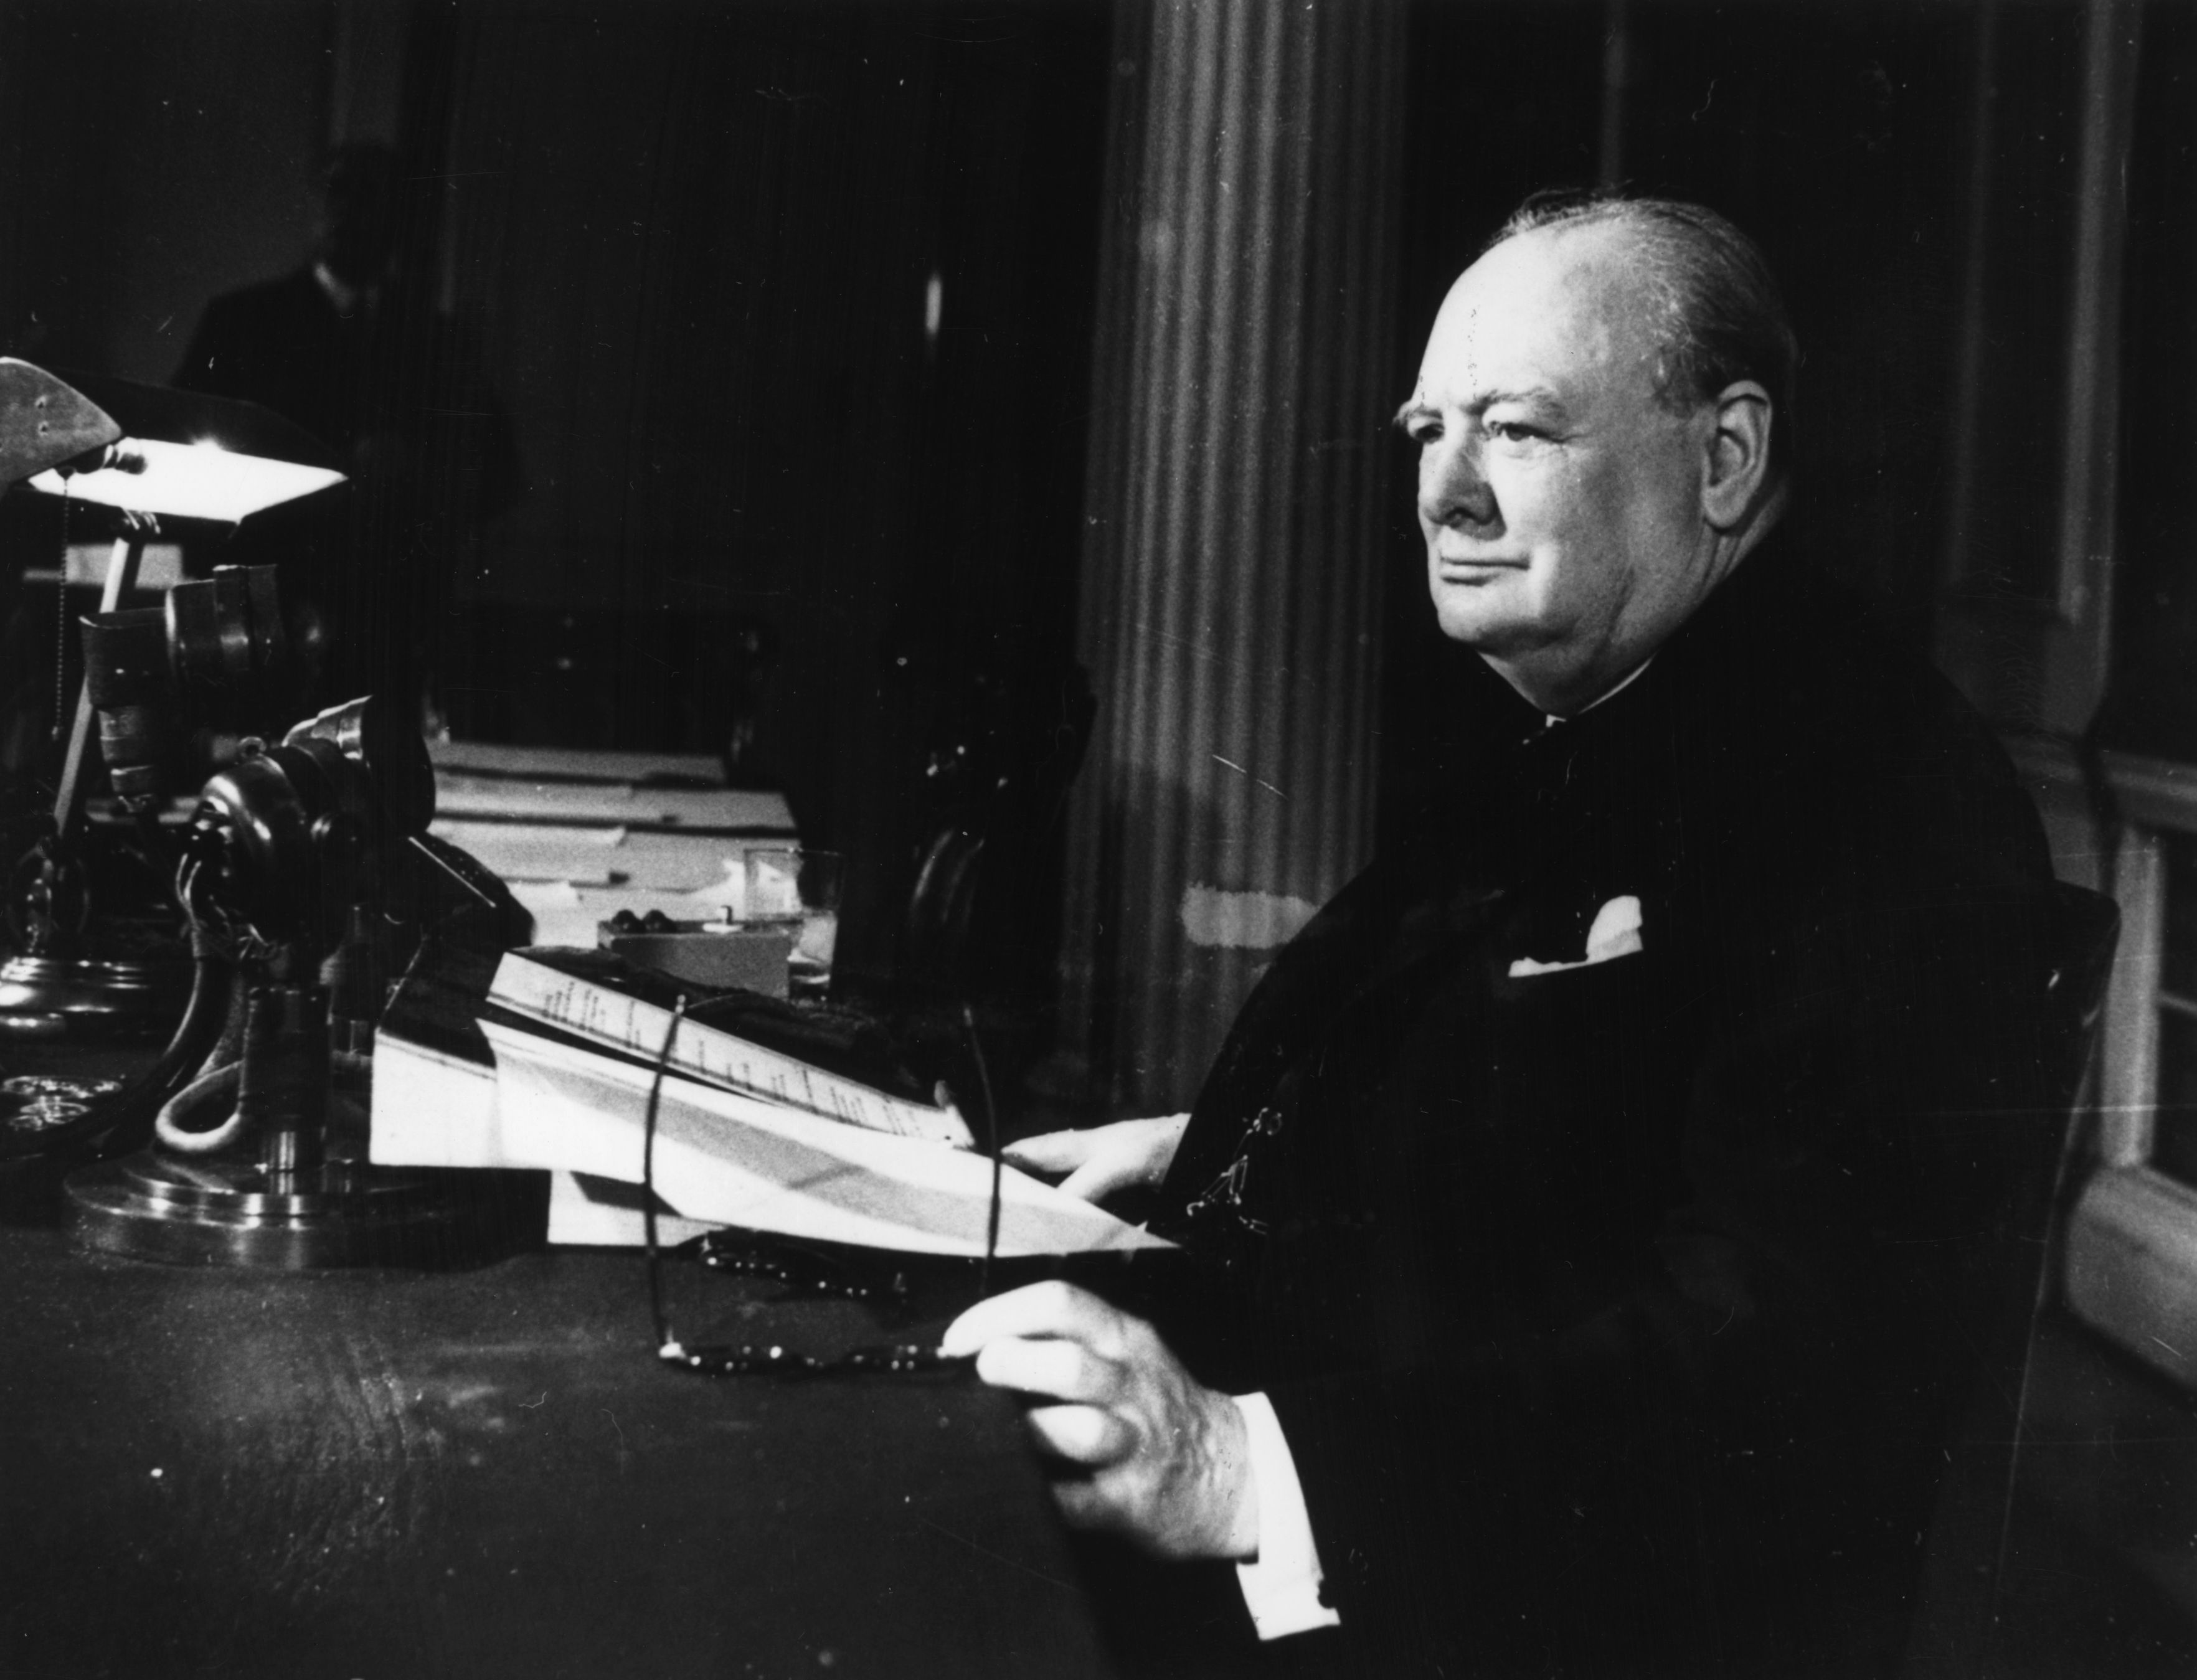 Churchill writing at his desk